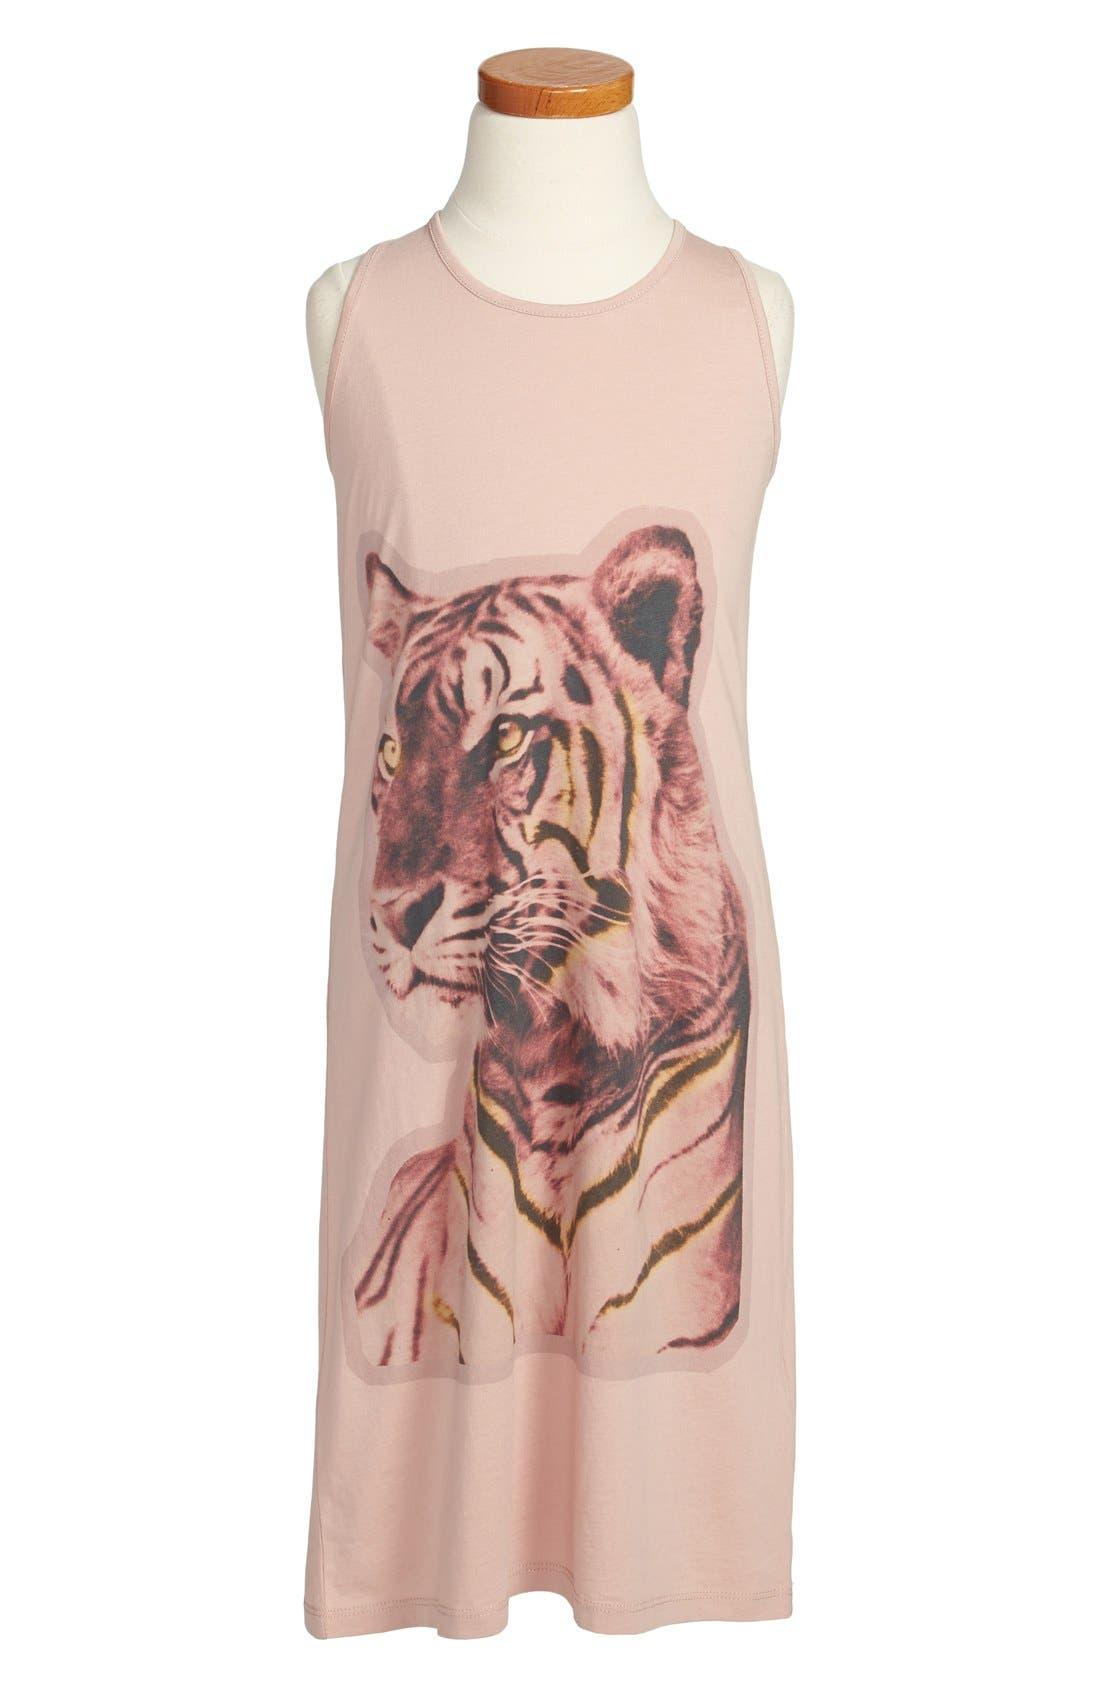 Main Image - Stella McCartney 'Mia' Tiger Screenprint Tank Dress (Toddler Girls, Little Girls & Big Girls)